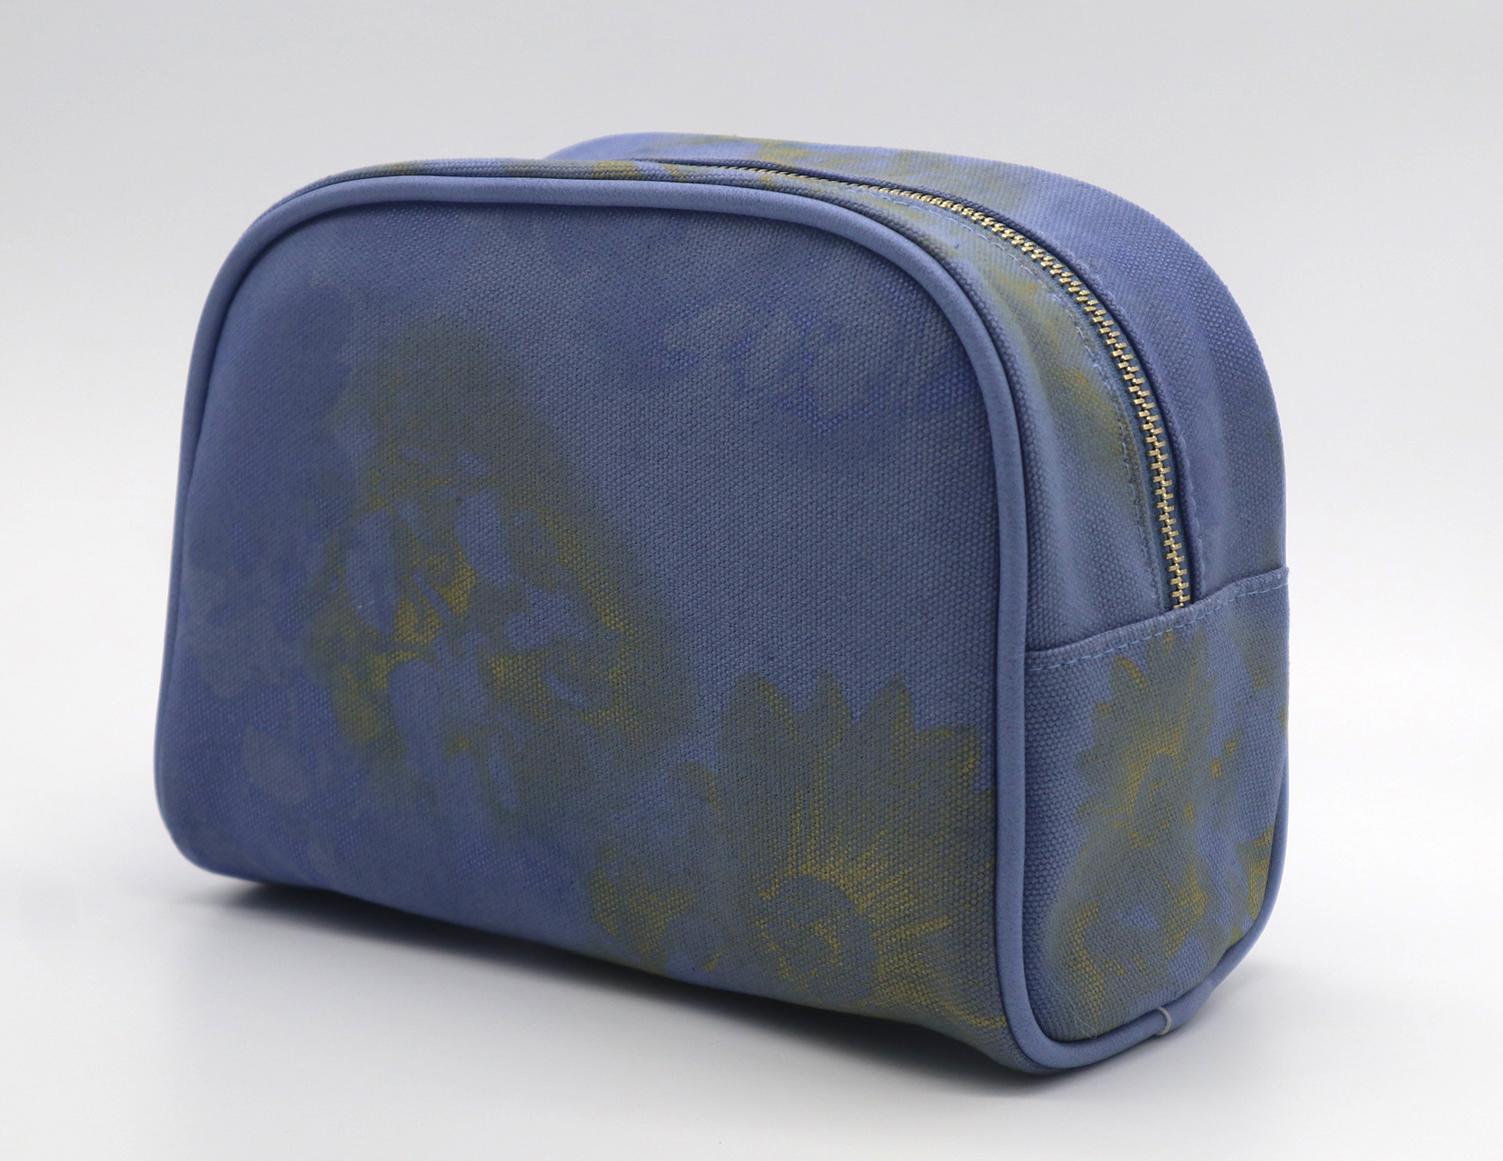 16oz canvas beauty women daisy cosmetic bag sky blue color 2